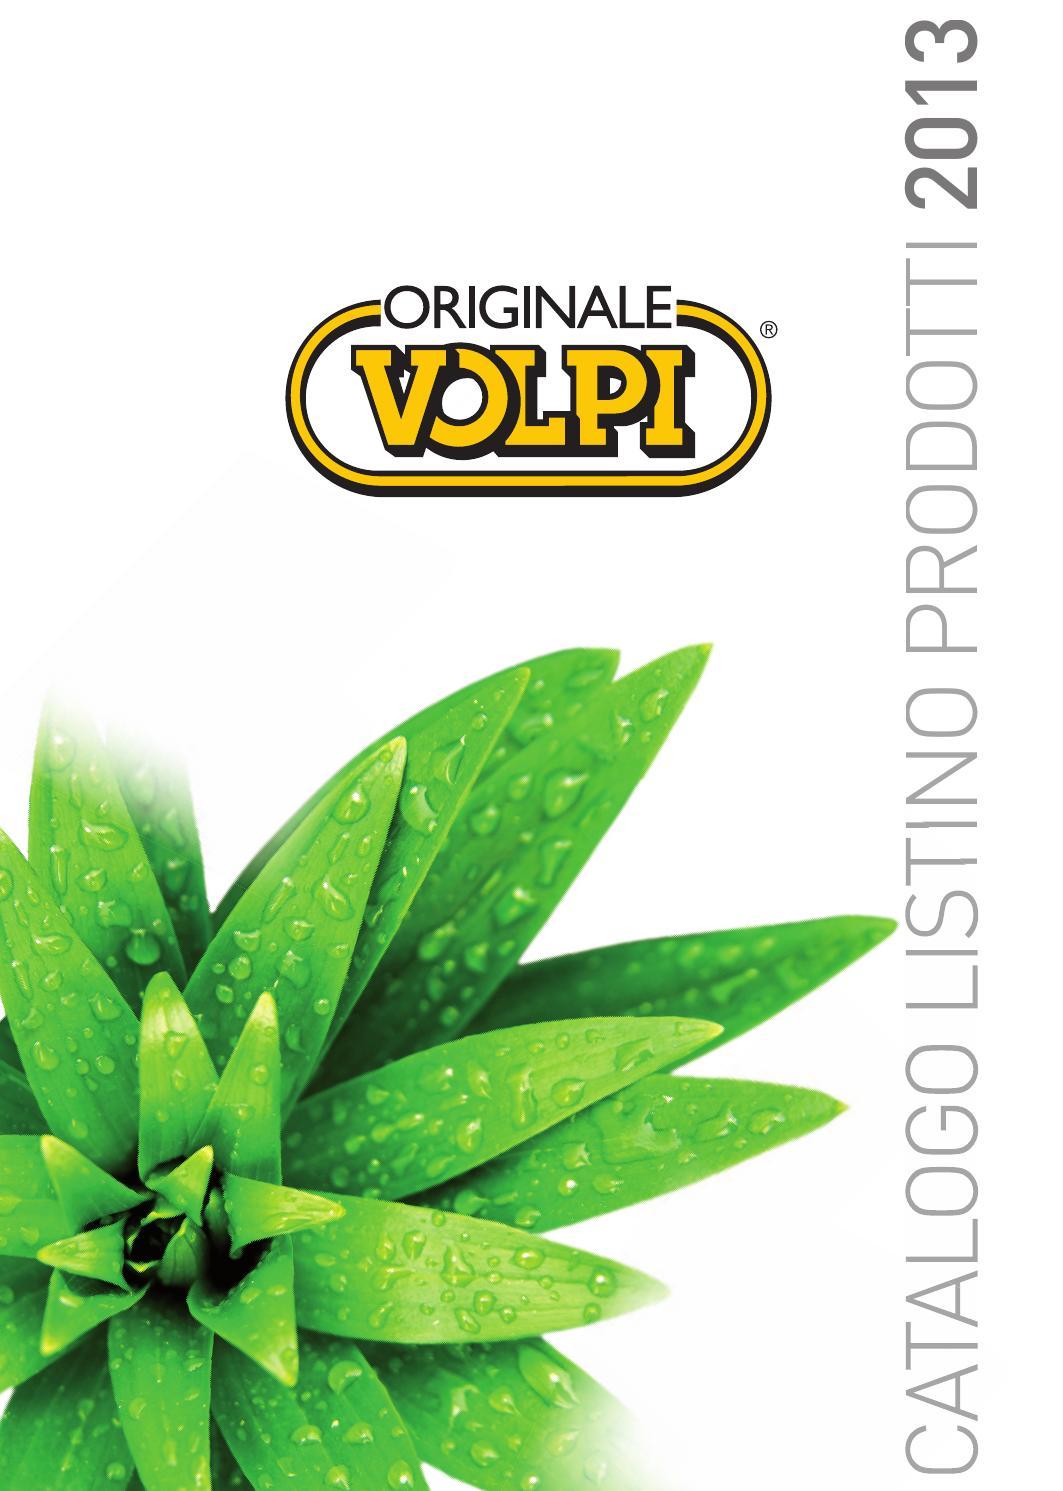 Cat logo volpi 2013 by decoralife issuu for Irrigatori oscillanti